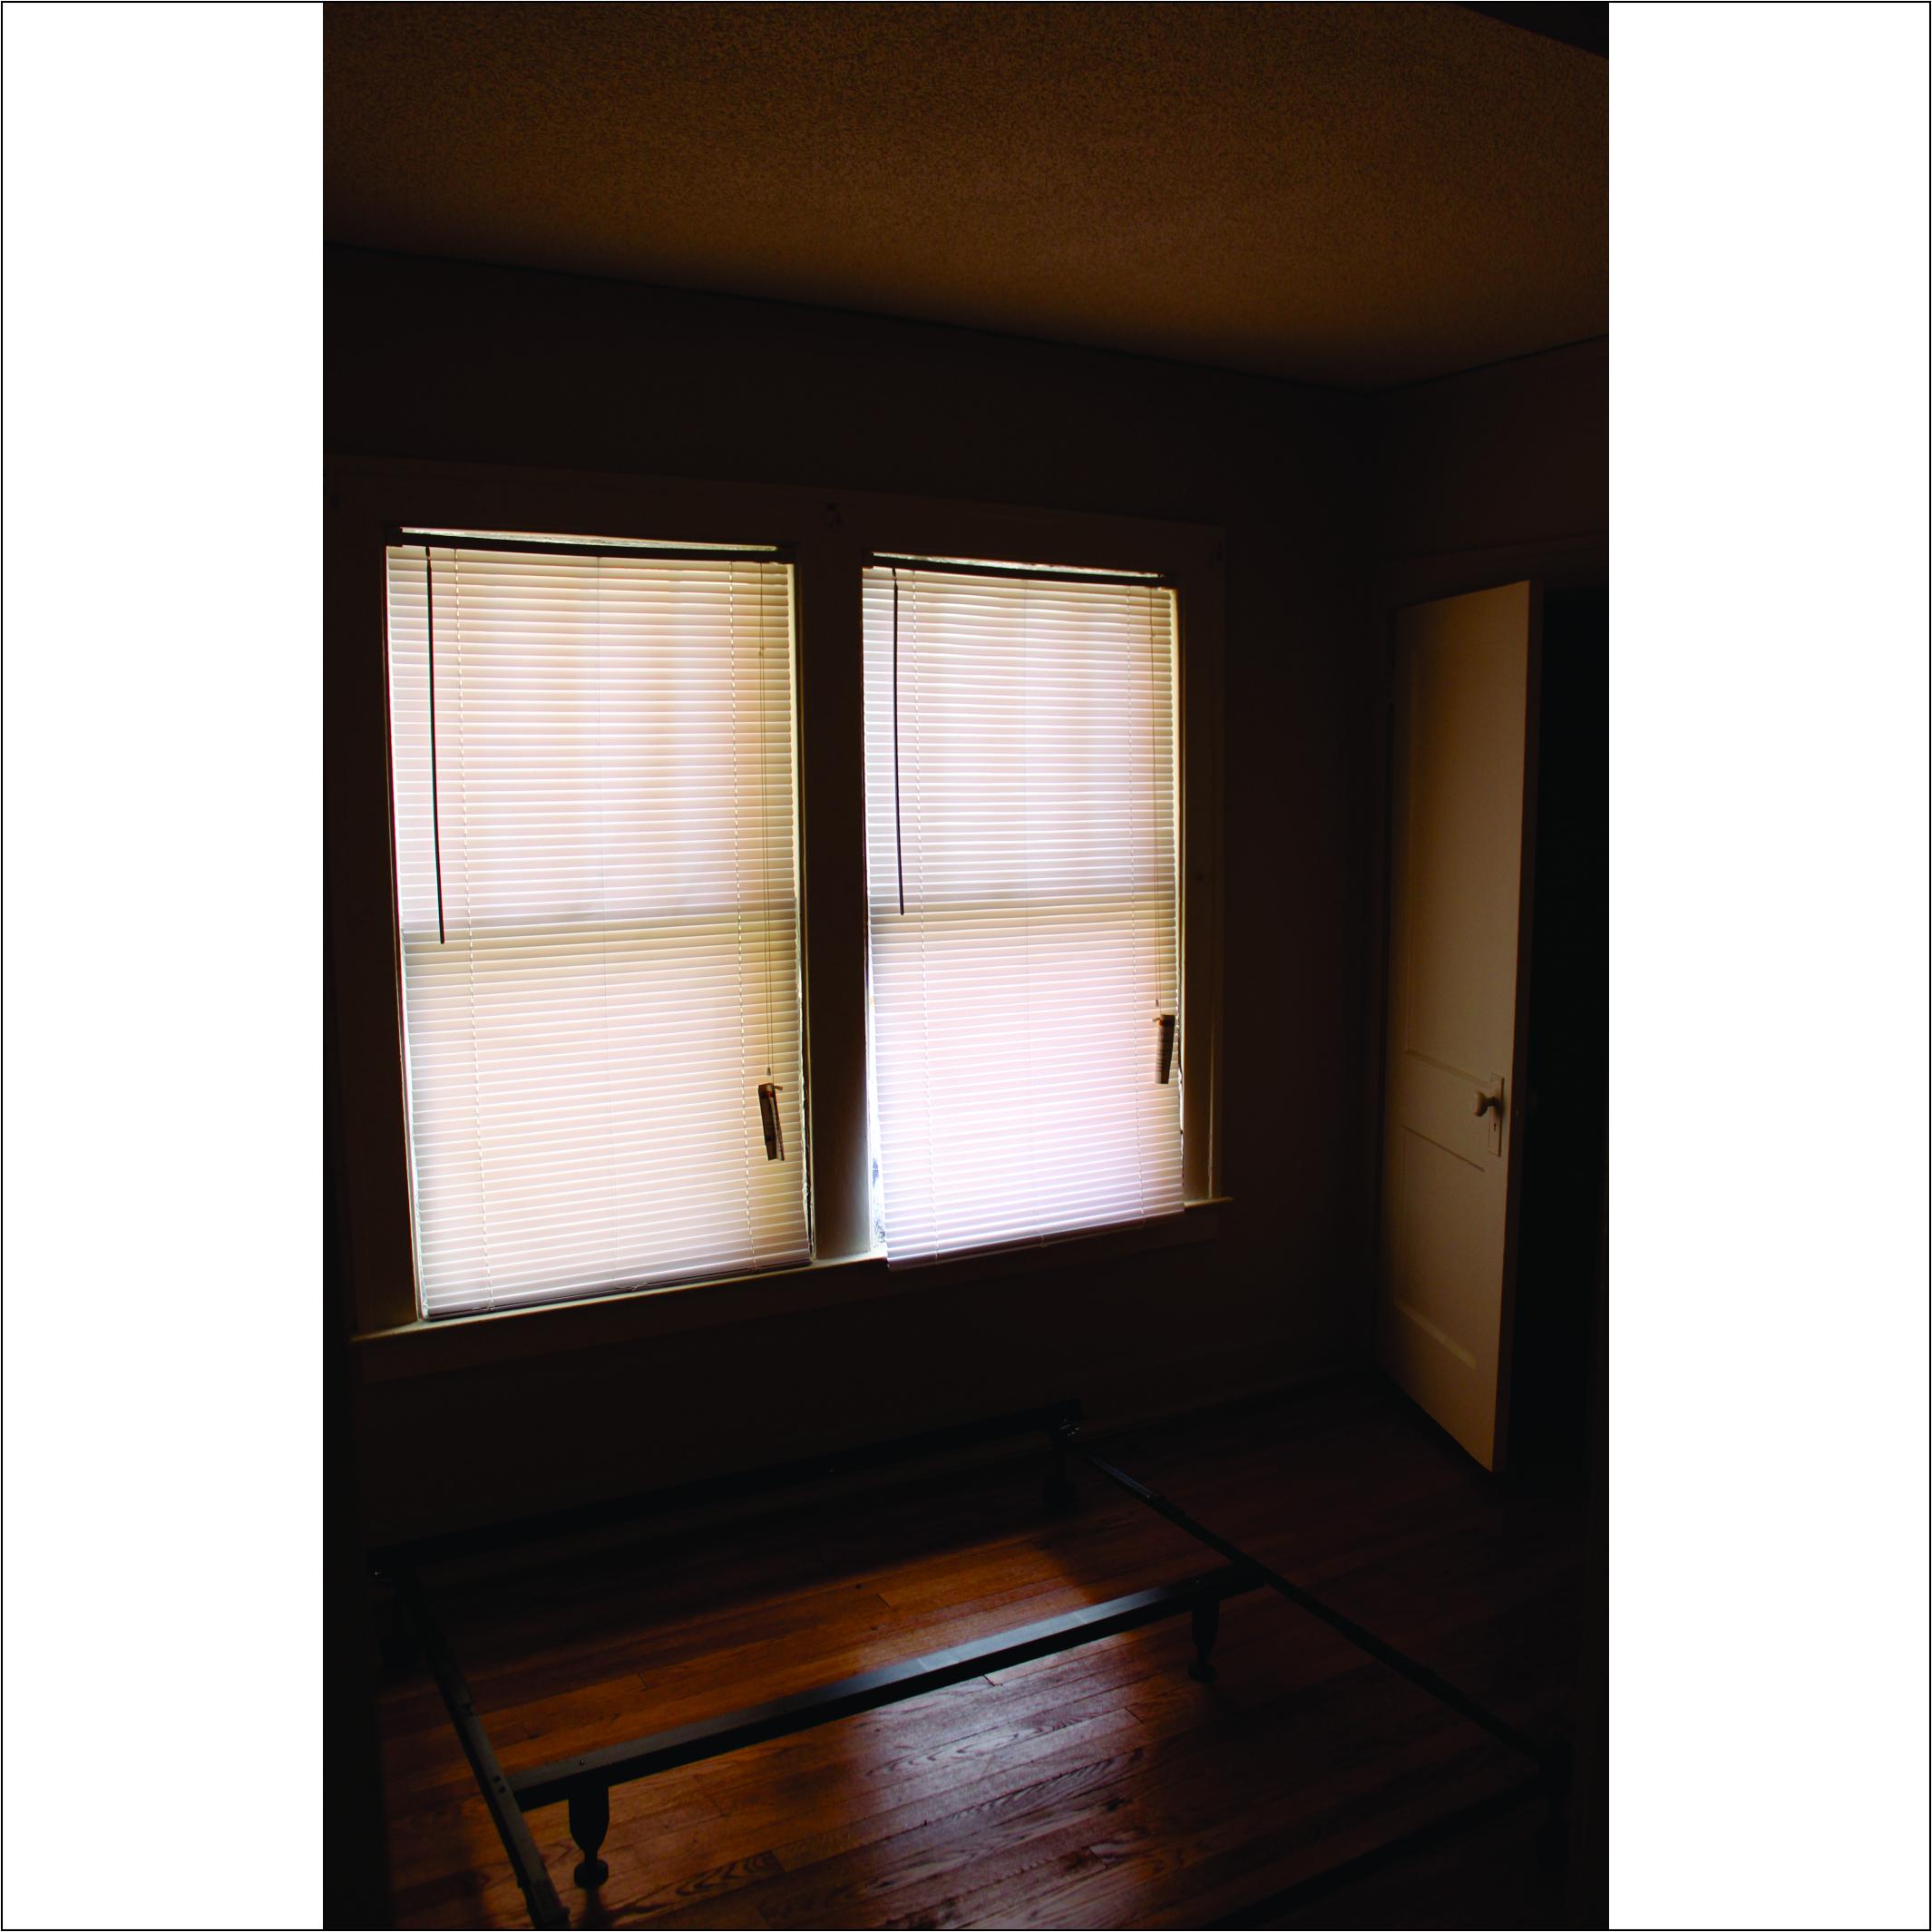 Metro Detroit 3 Bedroom 1.5 Bathroom Apartment For Rent